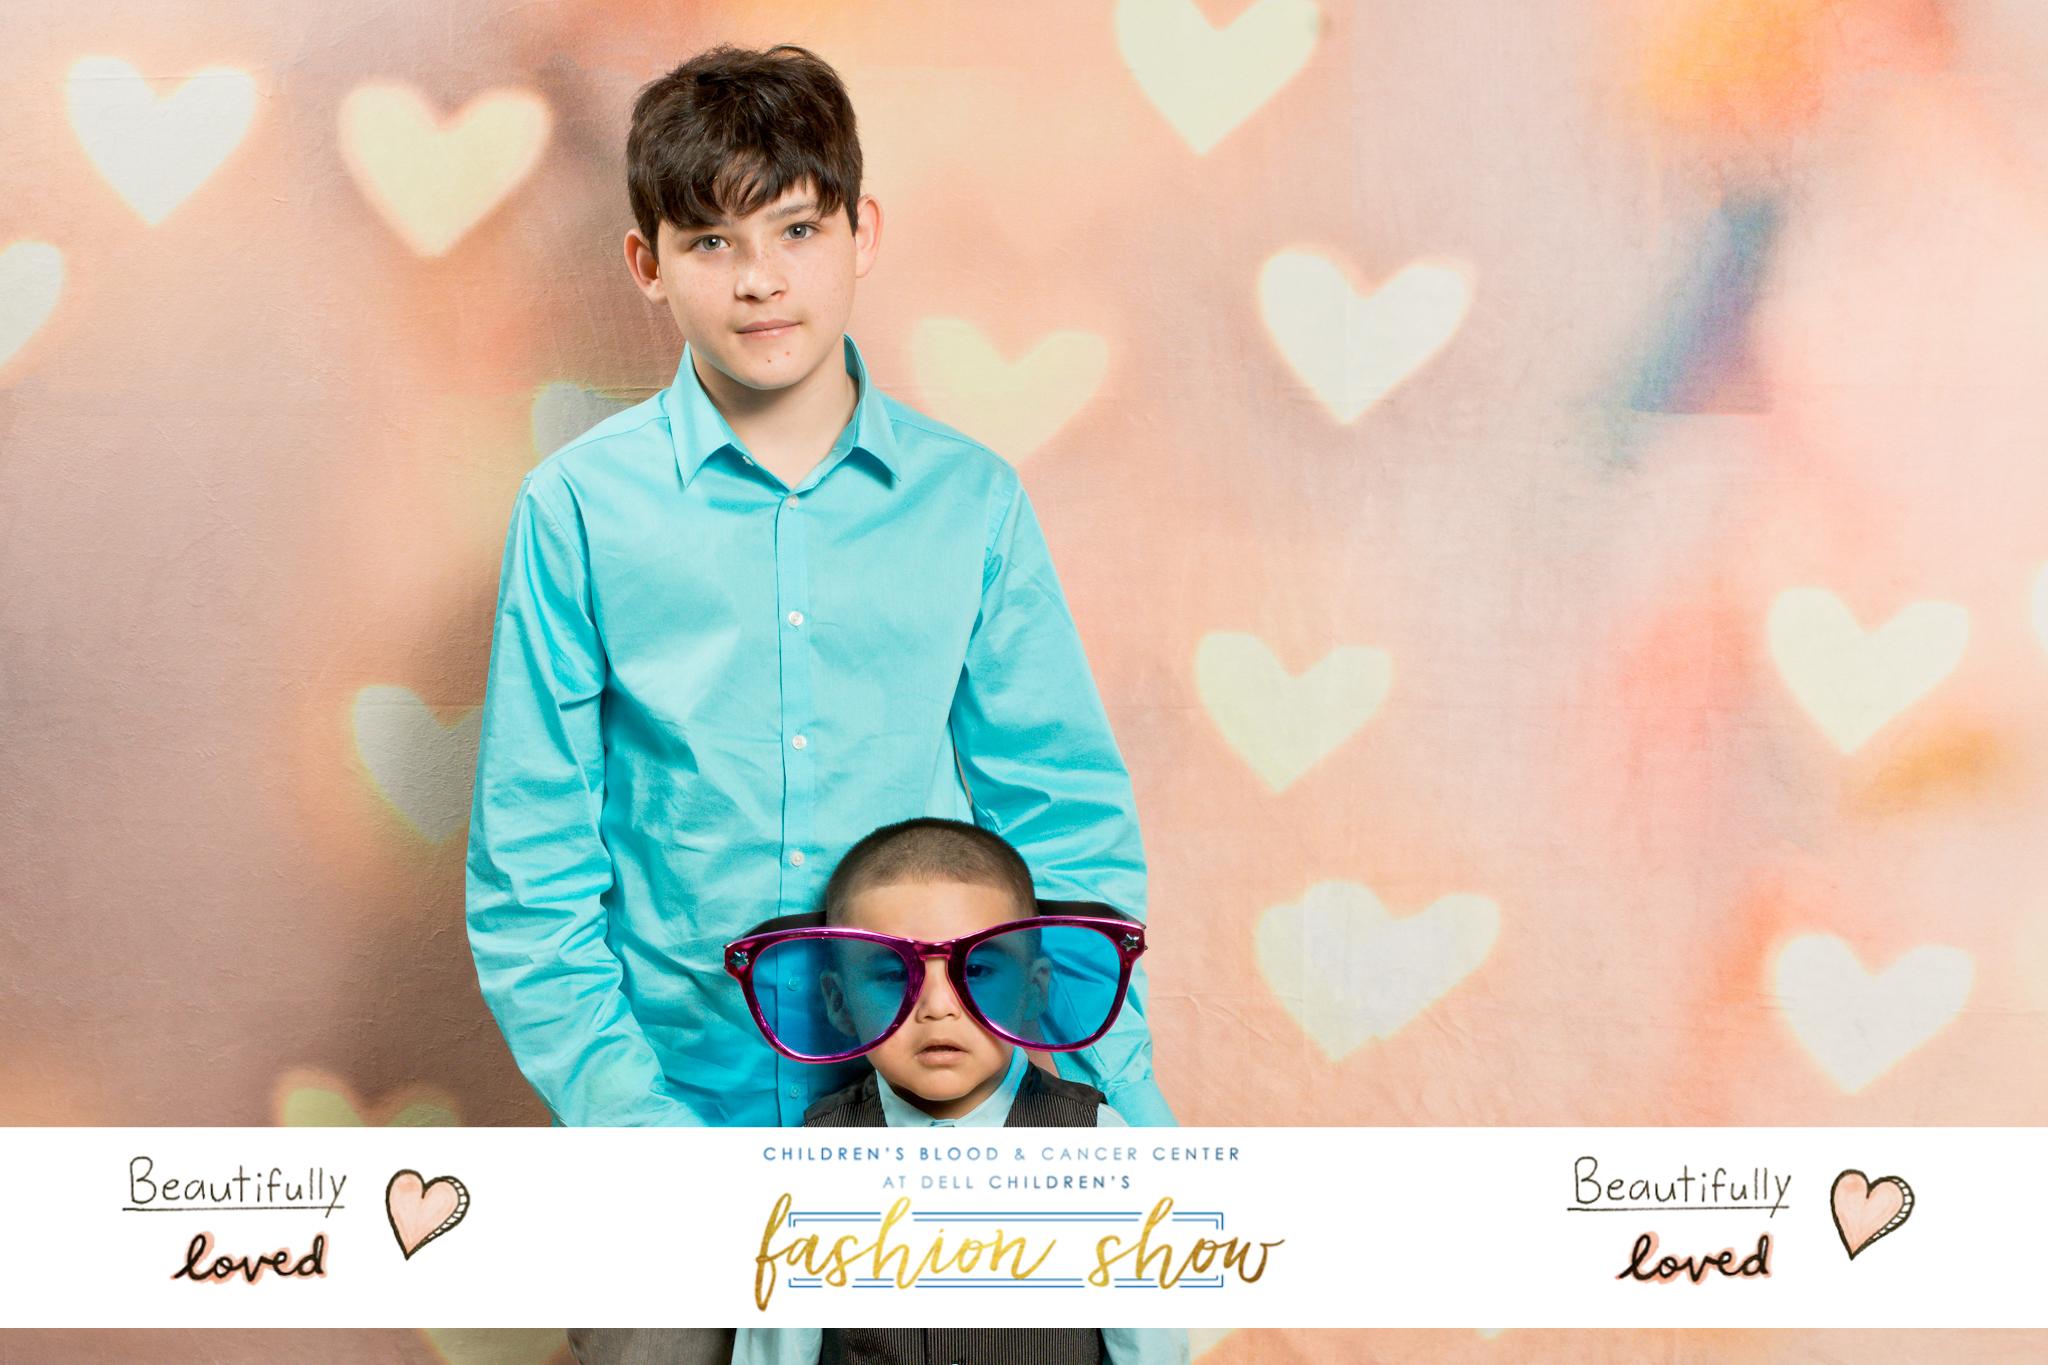 cbcc-dell-children-fashion-show-993-Edit-2-Edit-Edit.jpg